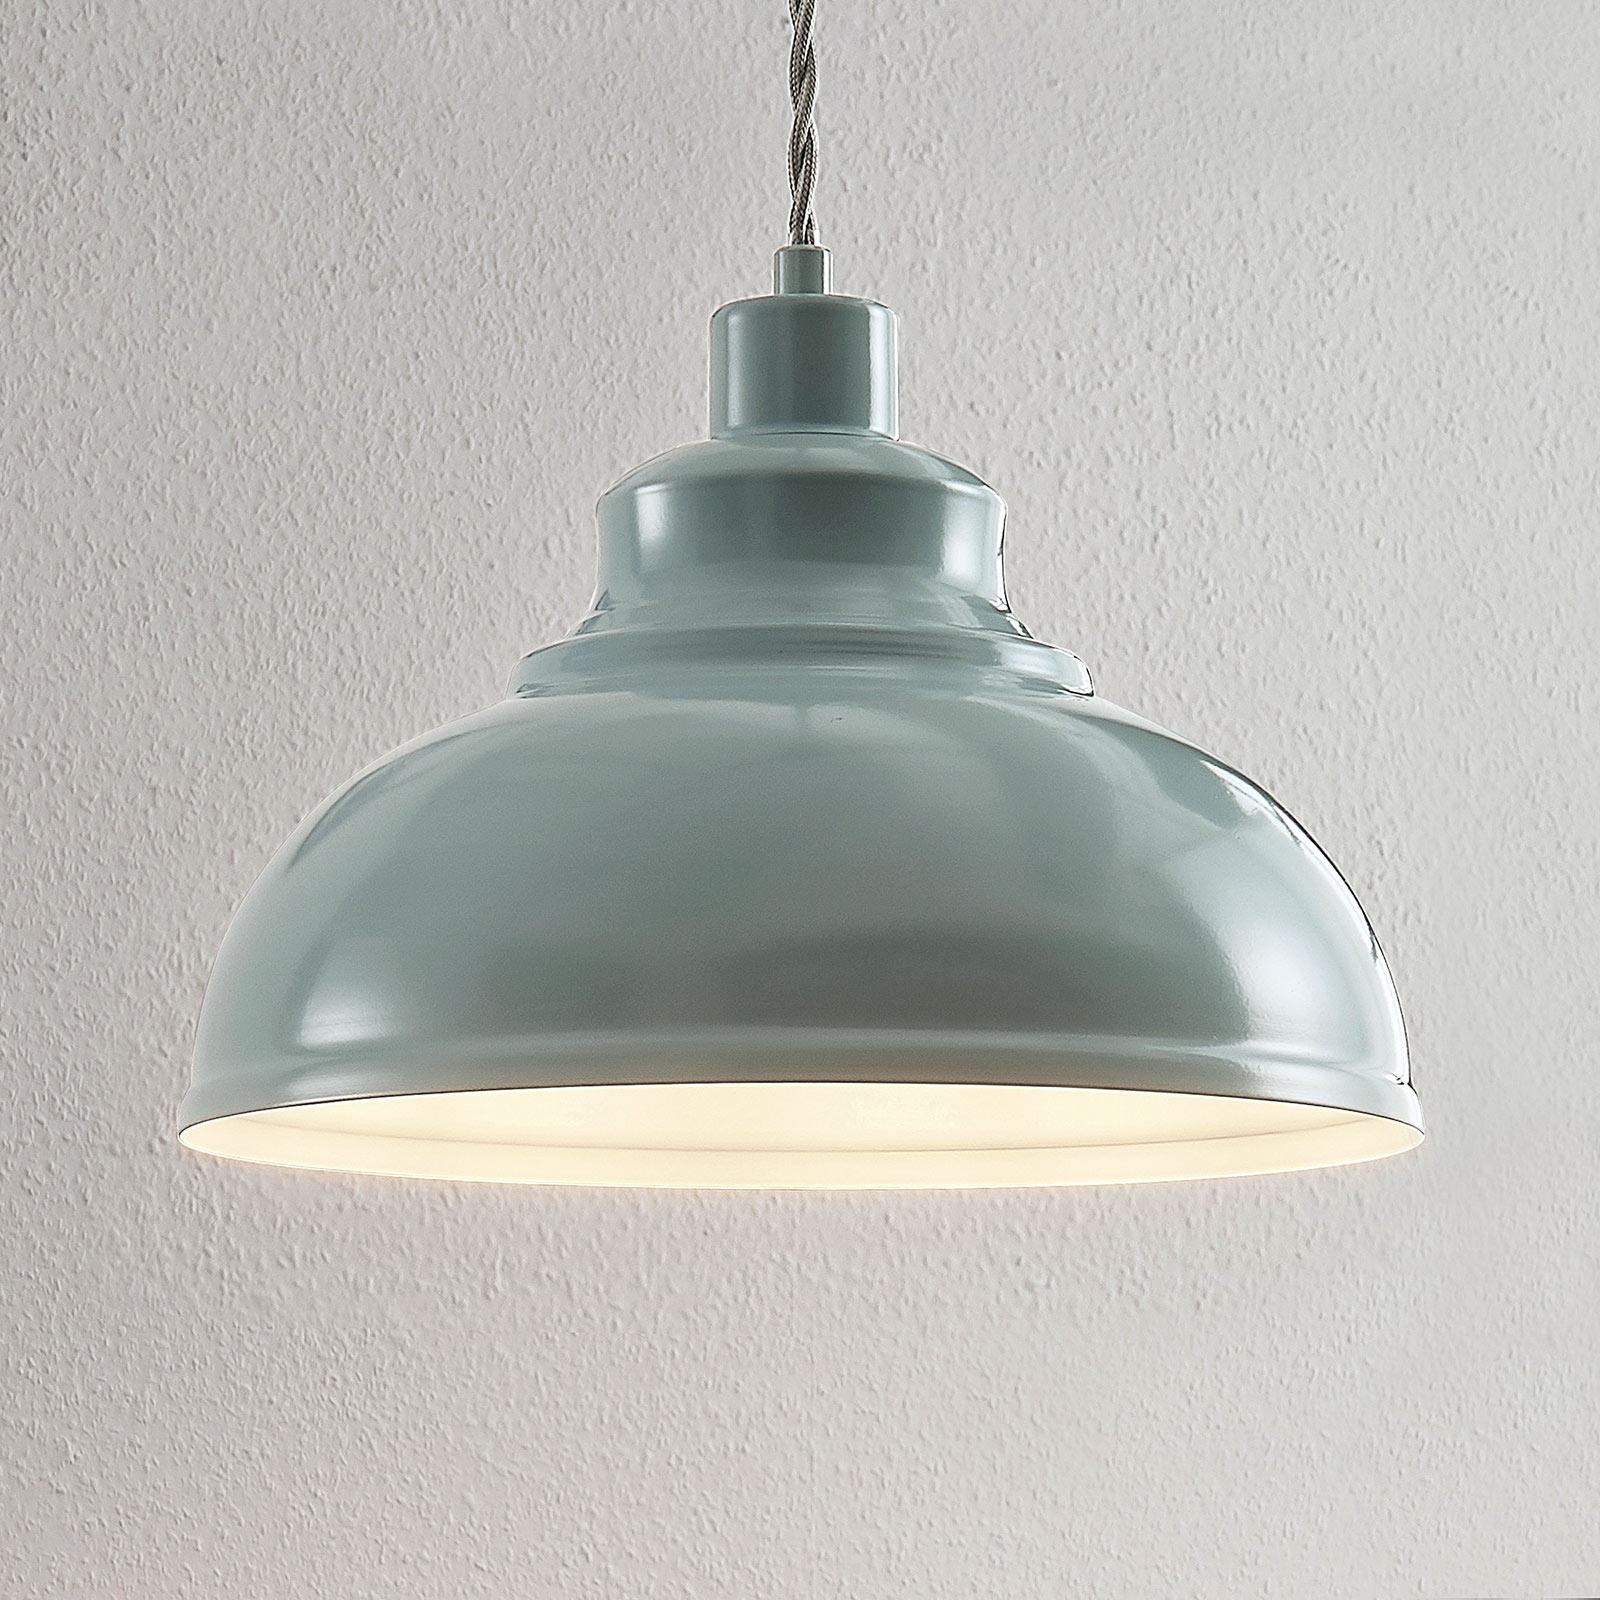 Vintage-pendellampa Albertine, metall, ljusblå